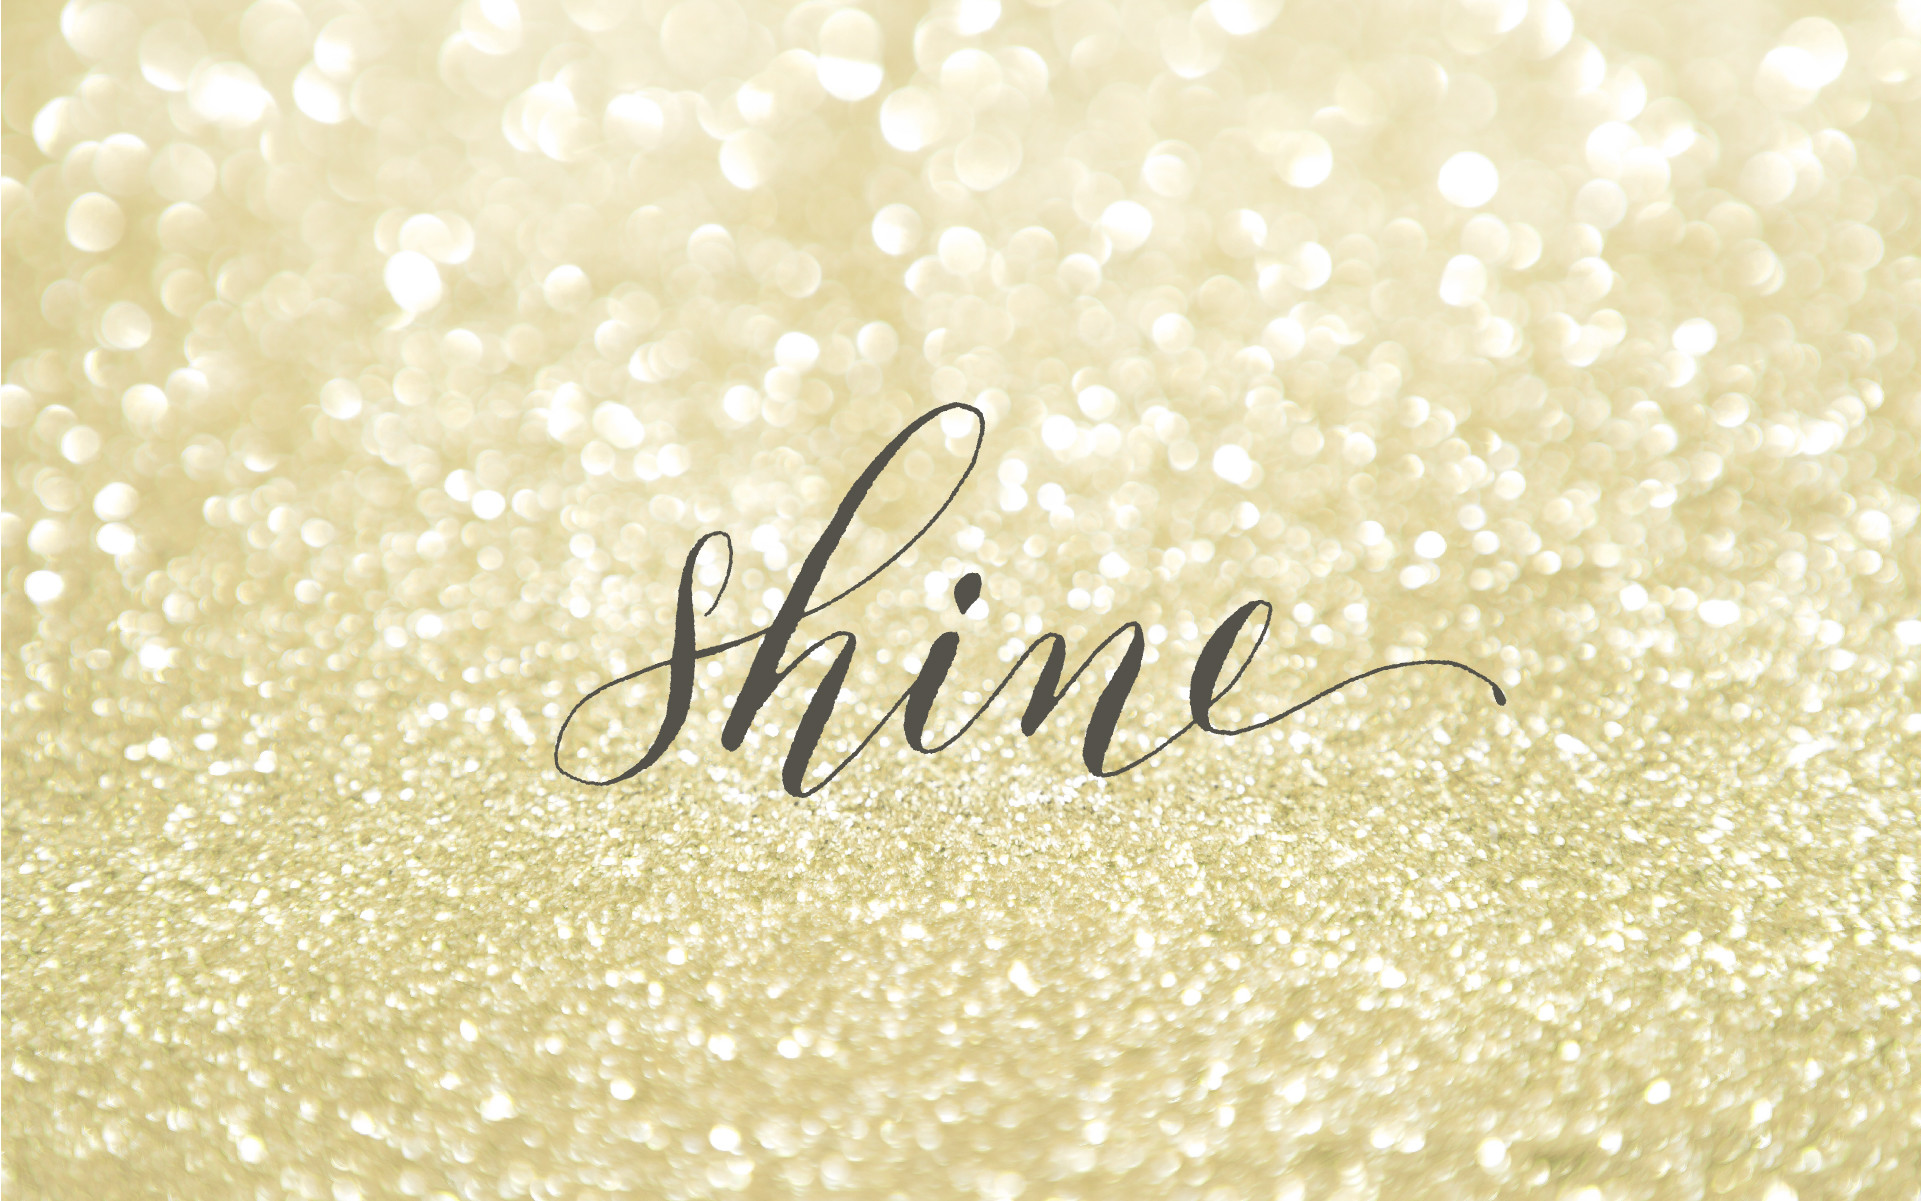 Gold grey glitter Shine desktop wallpaper background | Desktop | Pinterest  | Wallpaper backgrounds, Wallpaper and Macbook pro wallpaper